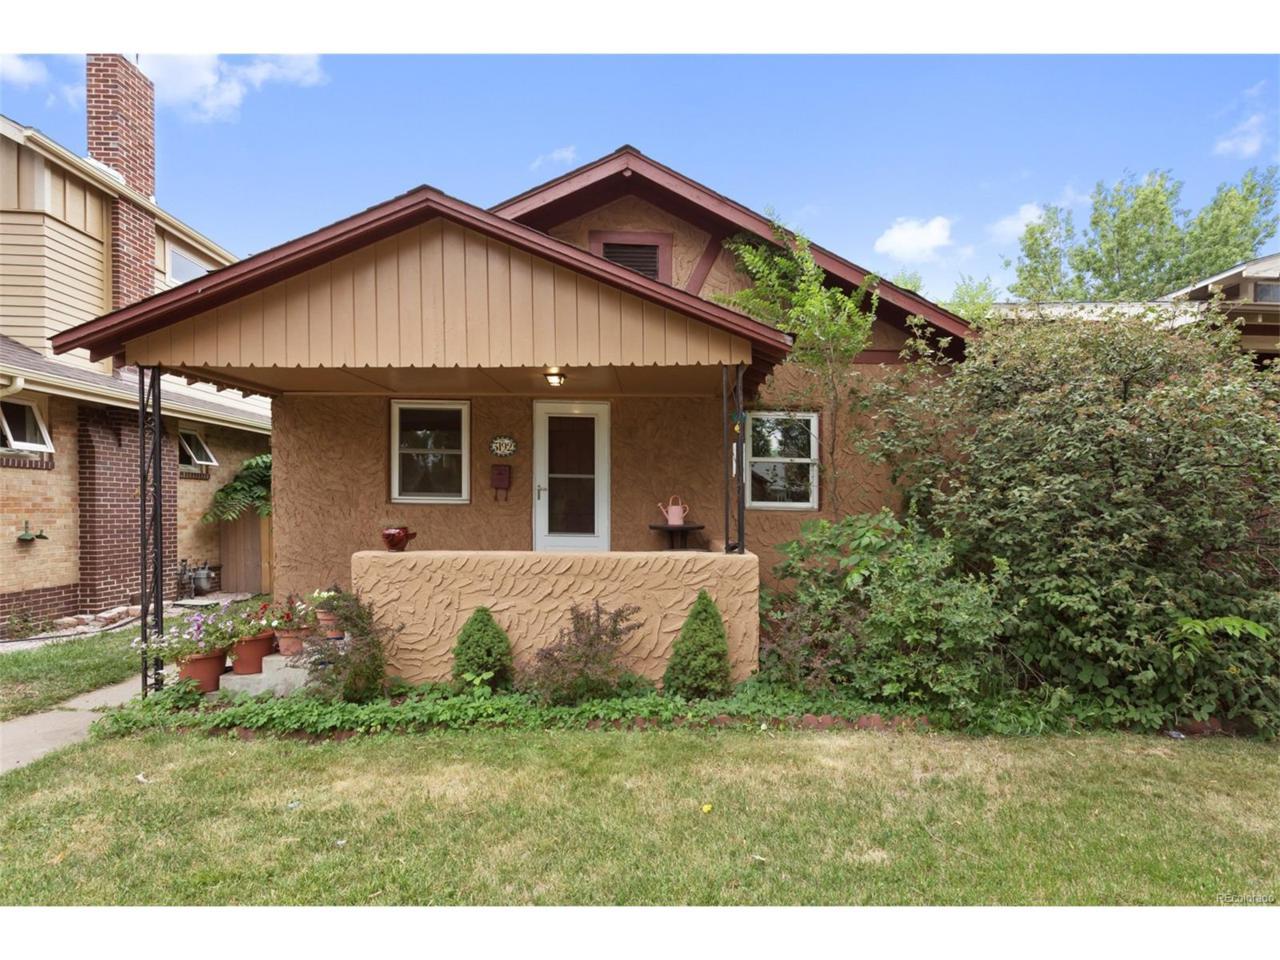 3192 W 40th Avenue, Denver, CO 80211 (MLS #3445485) :: 8z Real Estate